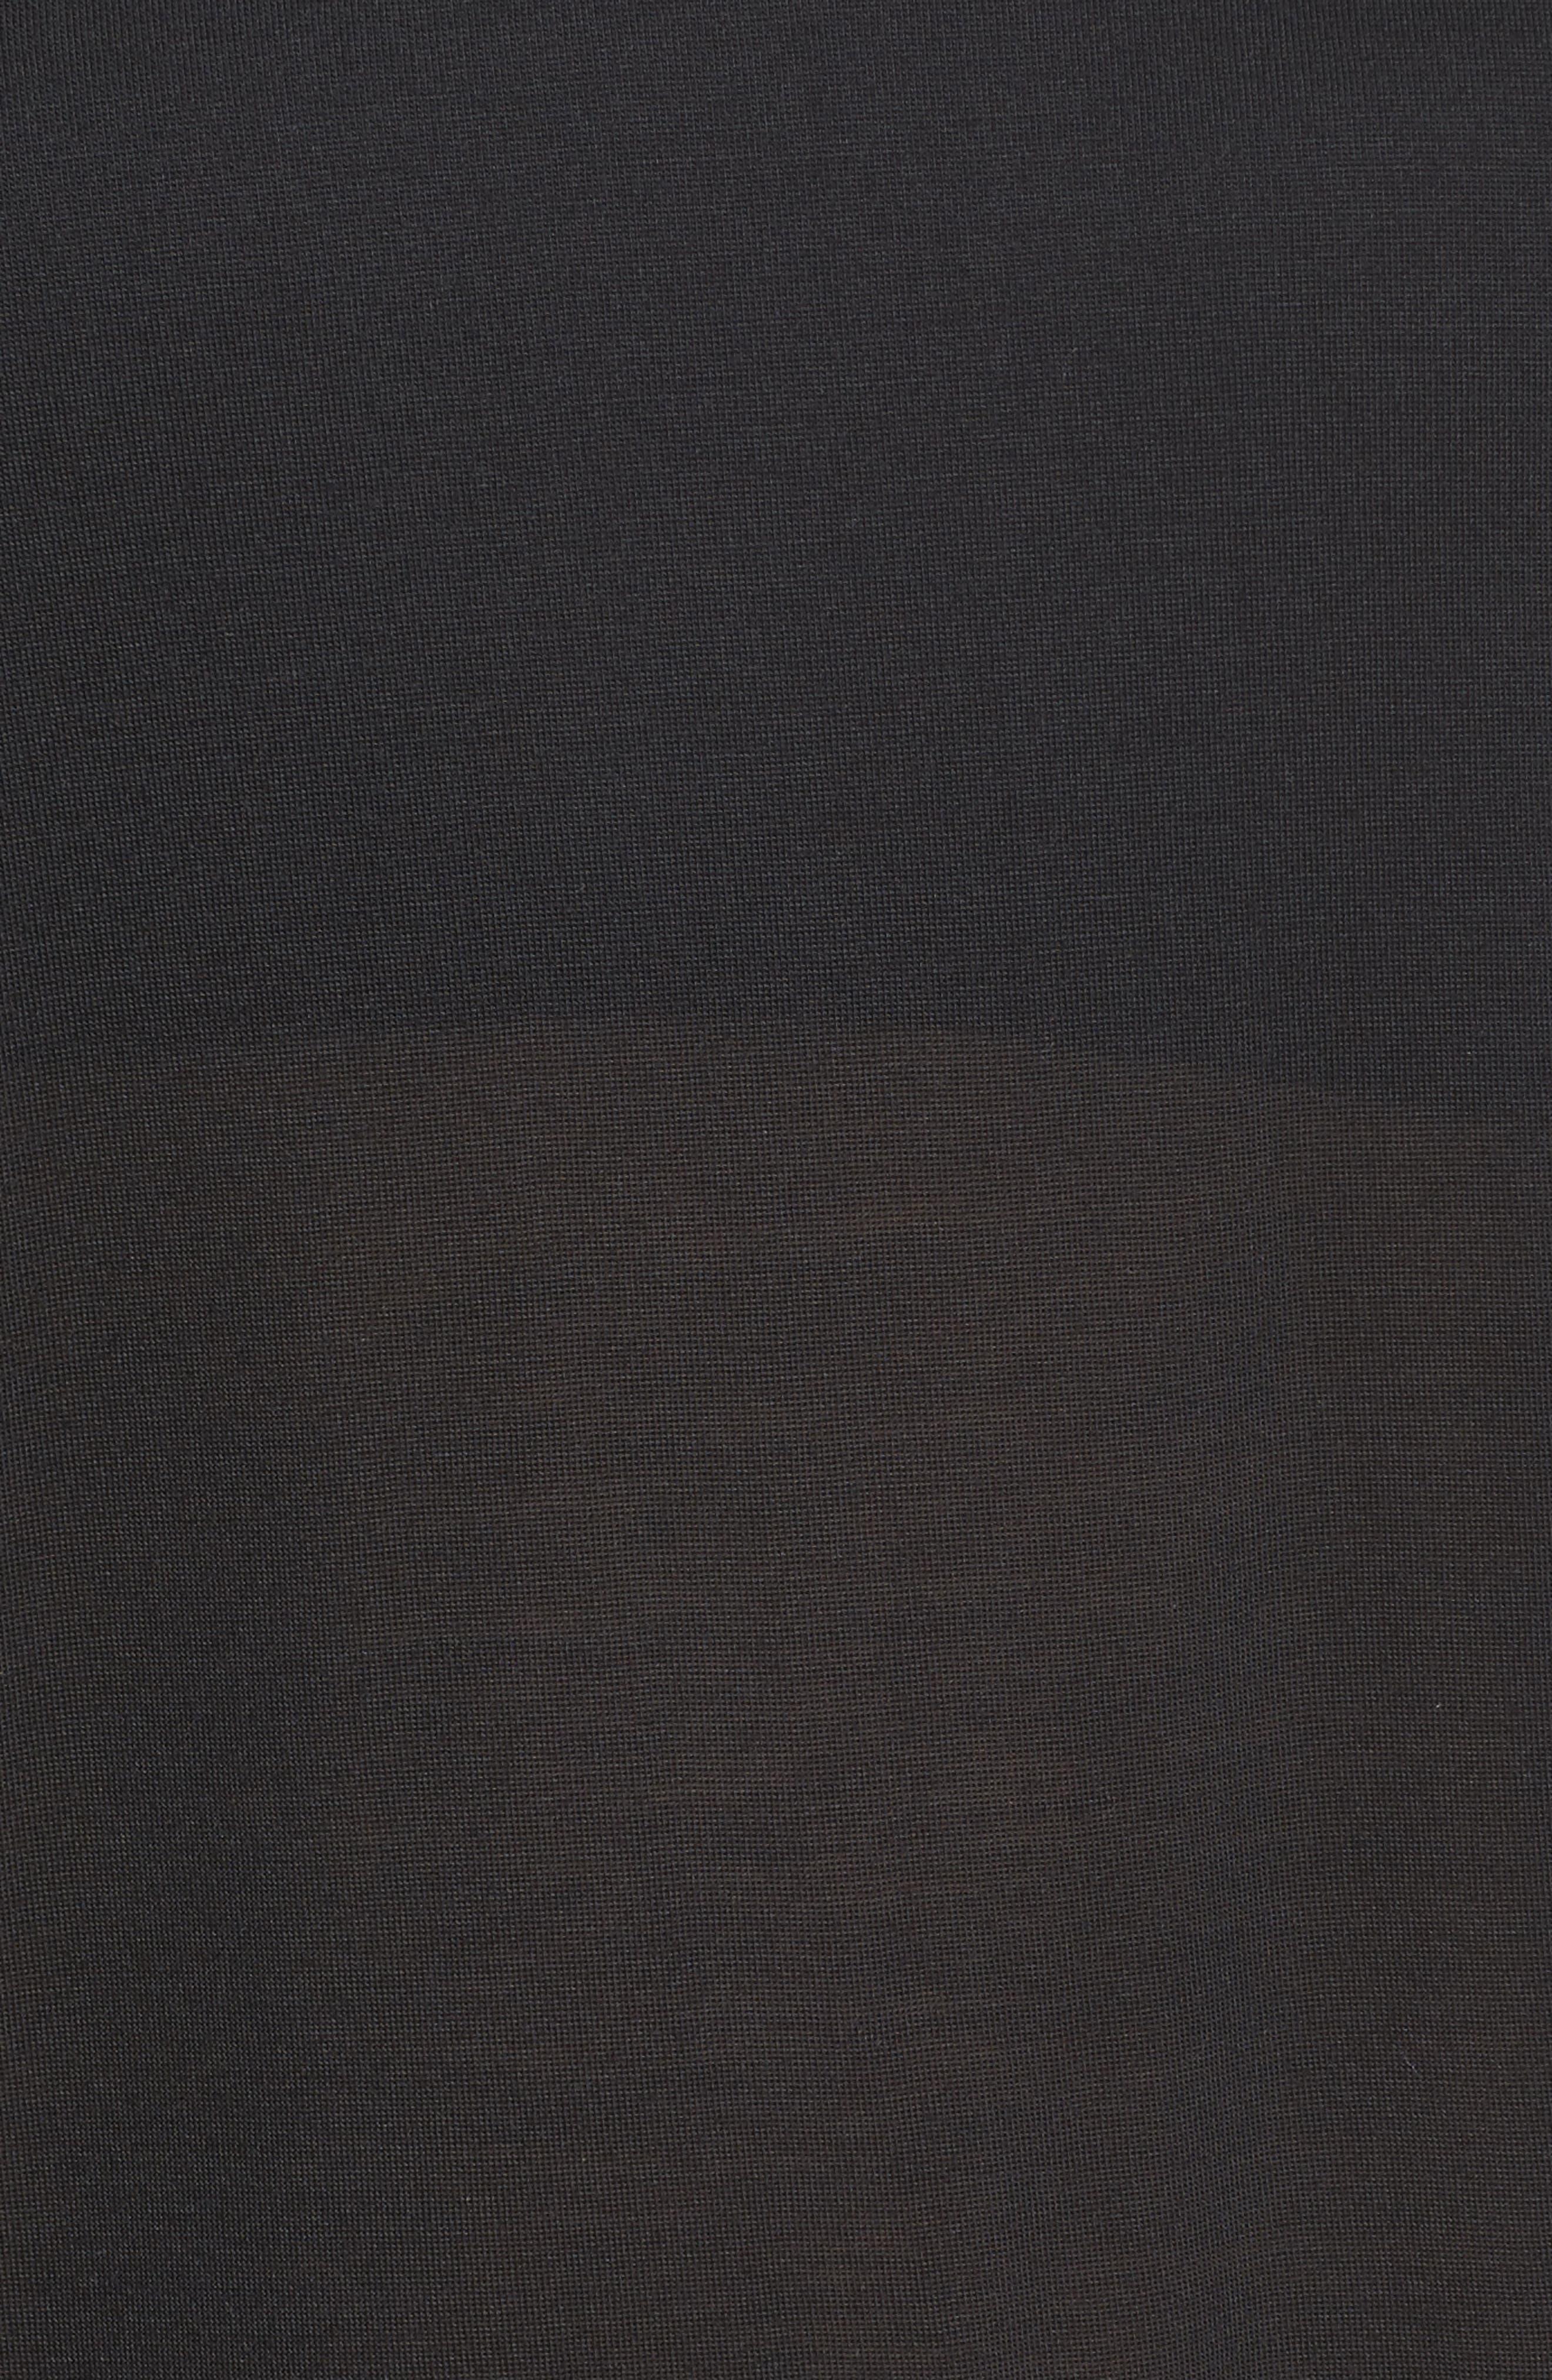 Tone Short Sleeve Tee,                             Alternate thumbnail 6, color,                             001